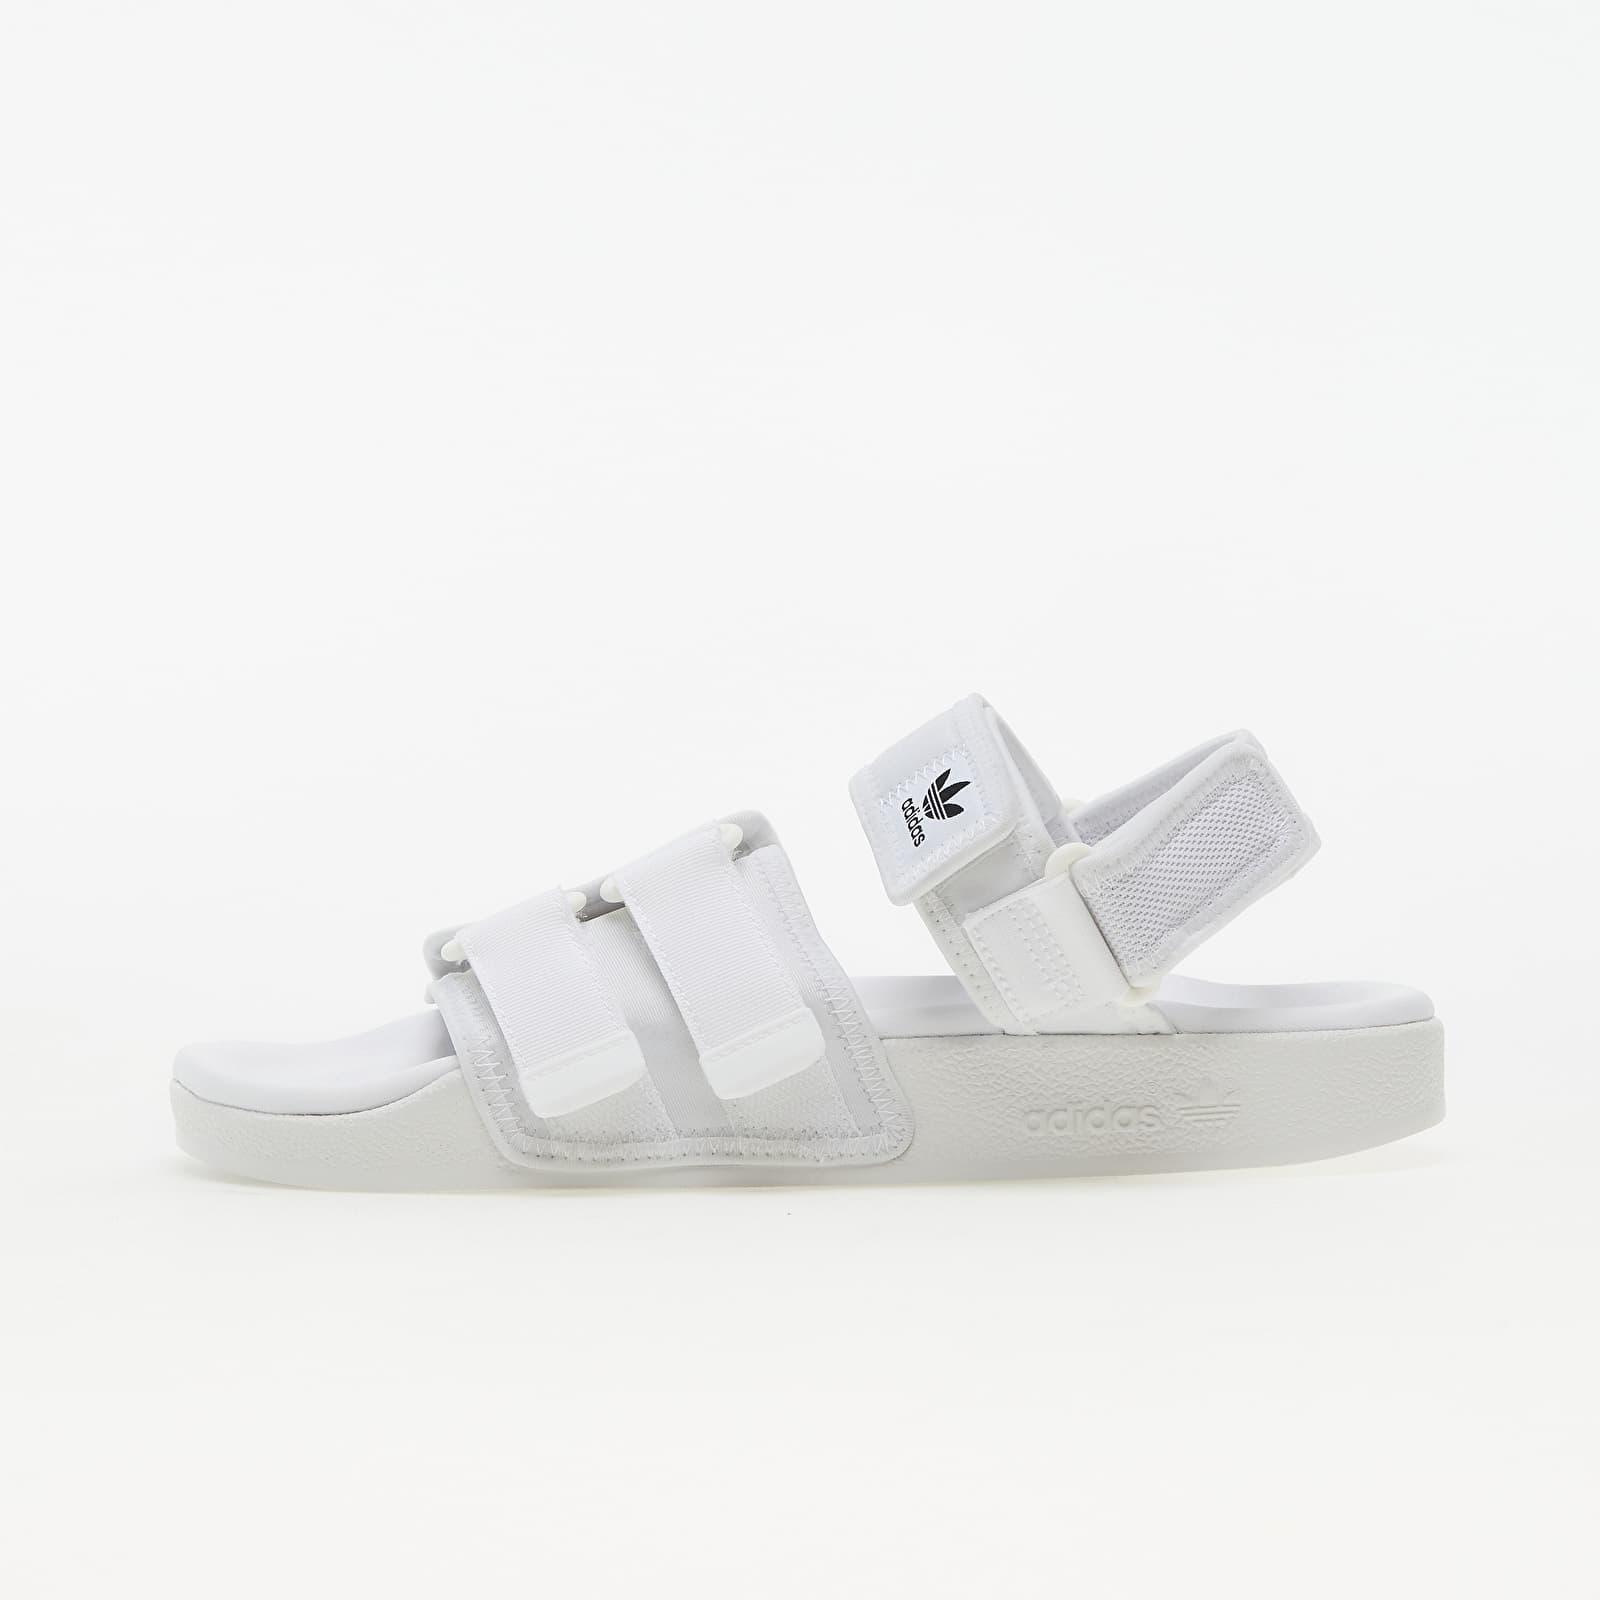 adidas Adilette Sandal 4.0 Ftw White/ Ftw White/ Core Black EUR 40.5